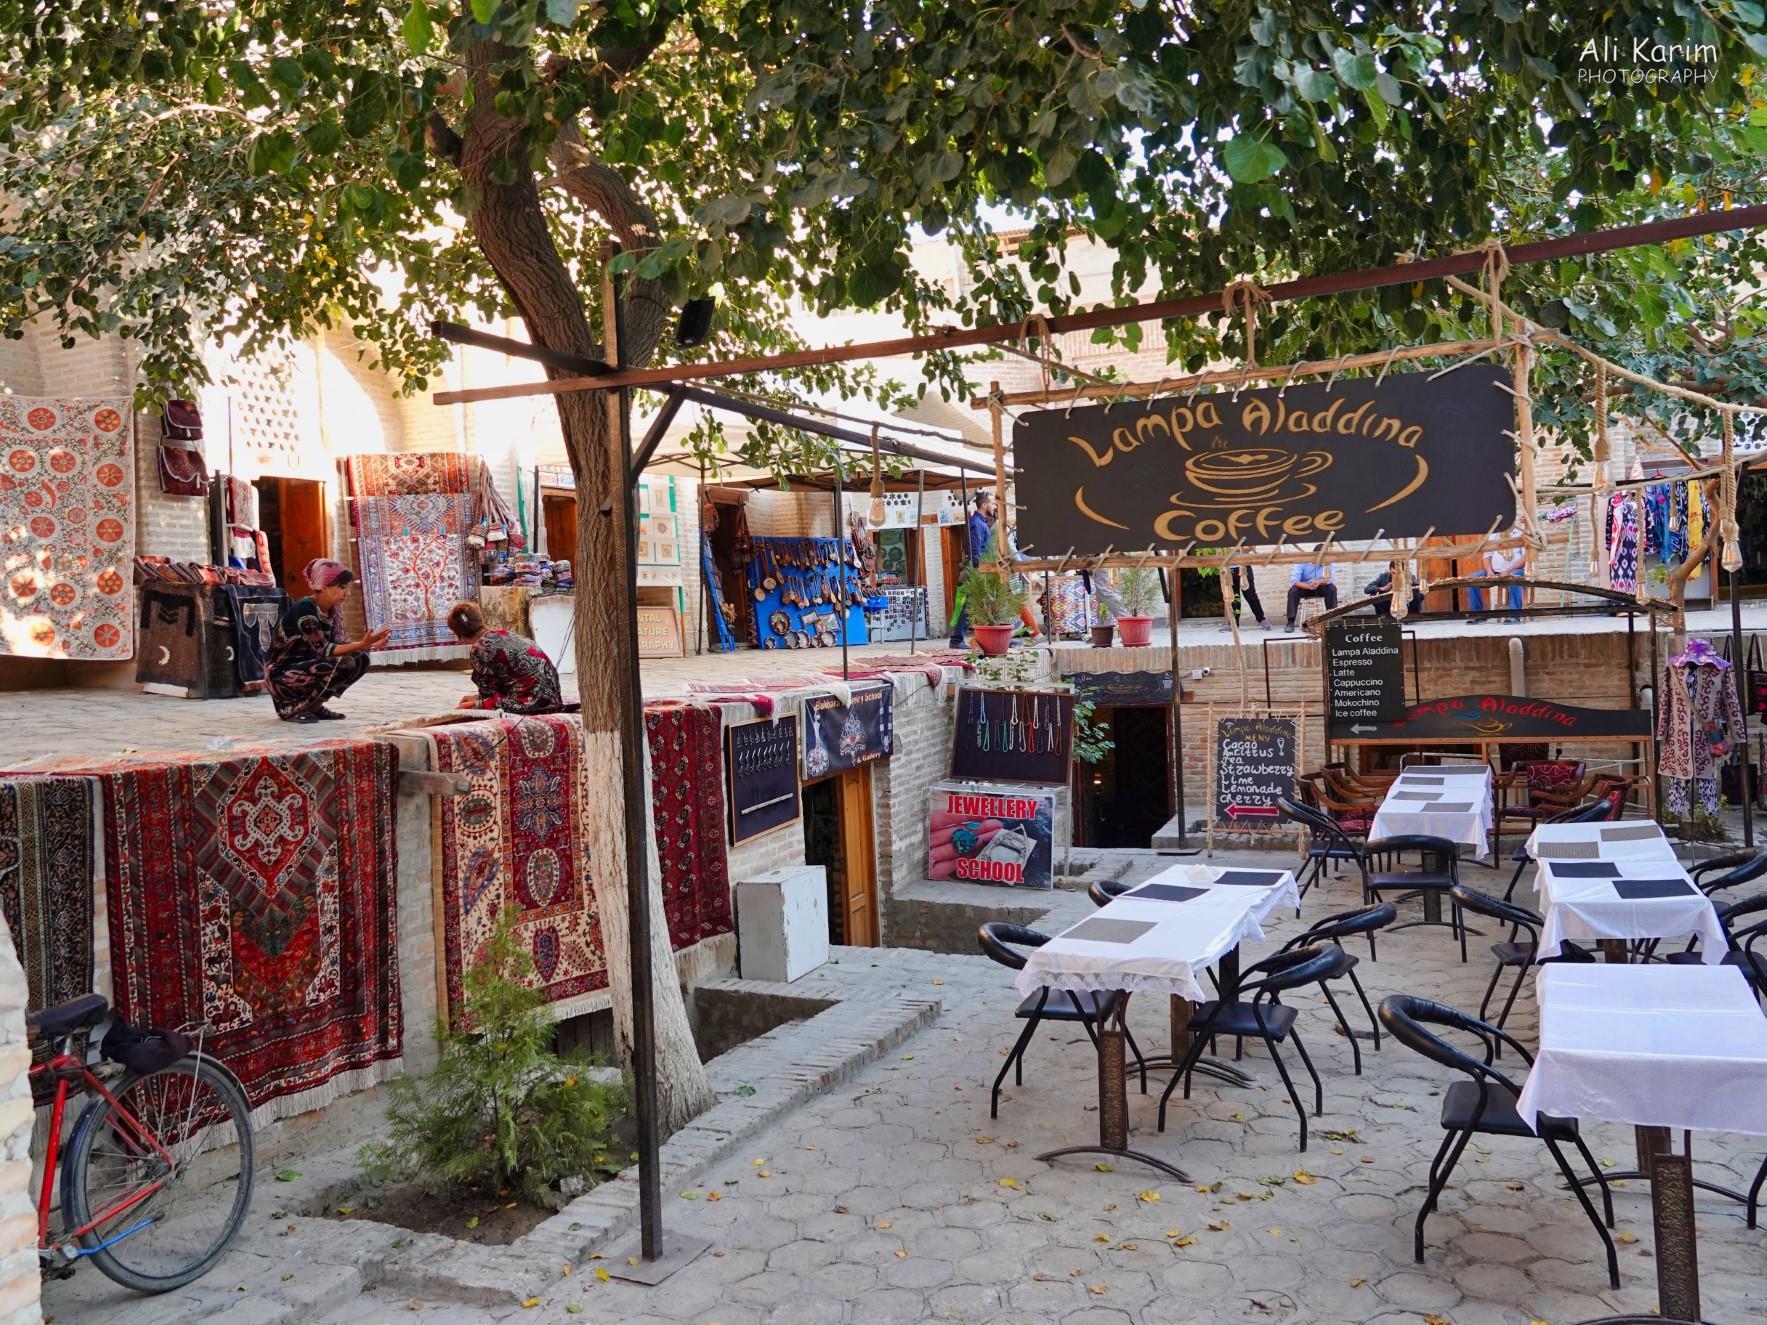 Bukhara, Oct 2019, Pleasant café & shops inside a restored Caravansarai